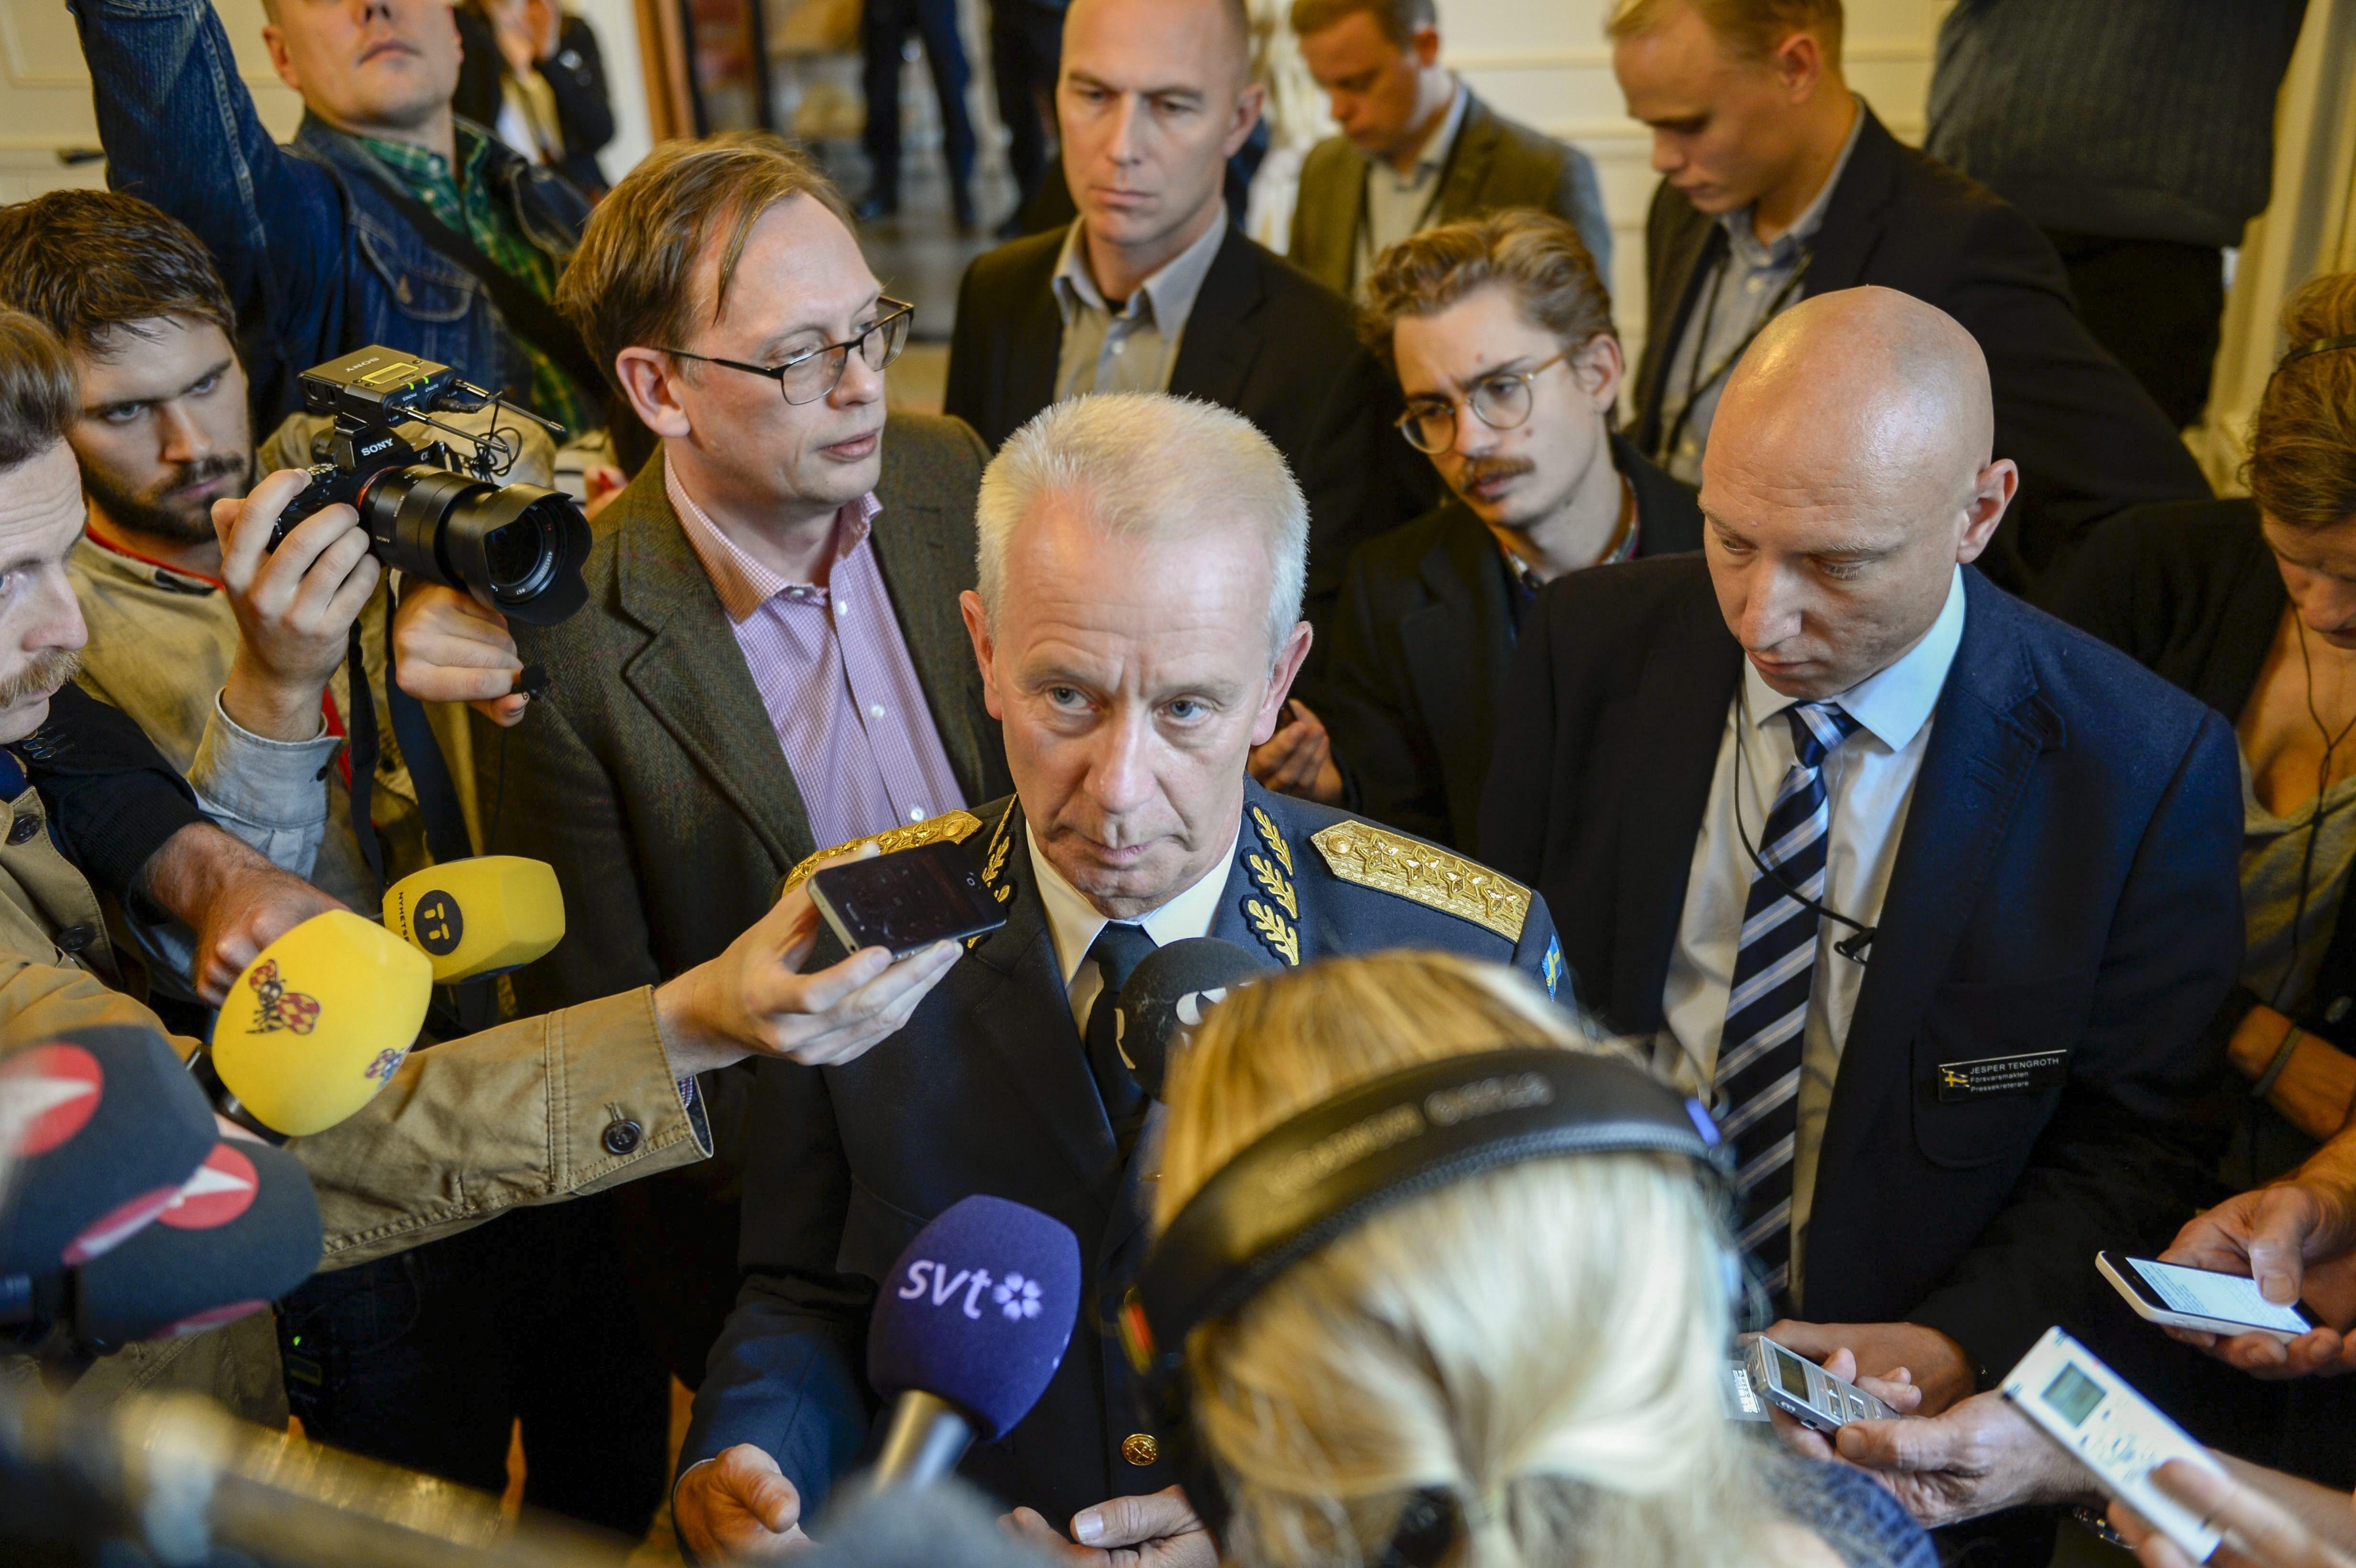 Swedish Commander-in-Chief Sverker Goransson talks to media on October 21, 2014. (Pontus Lundahl /AFP/Getty Images)